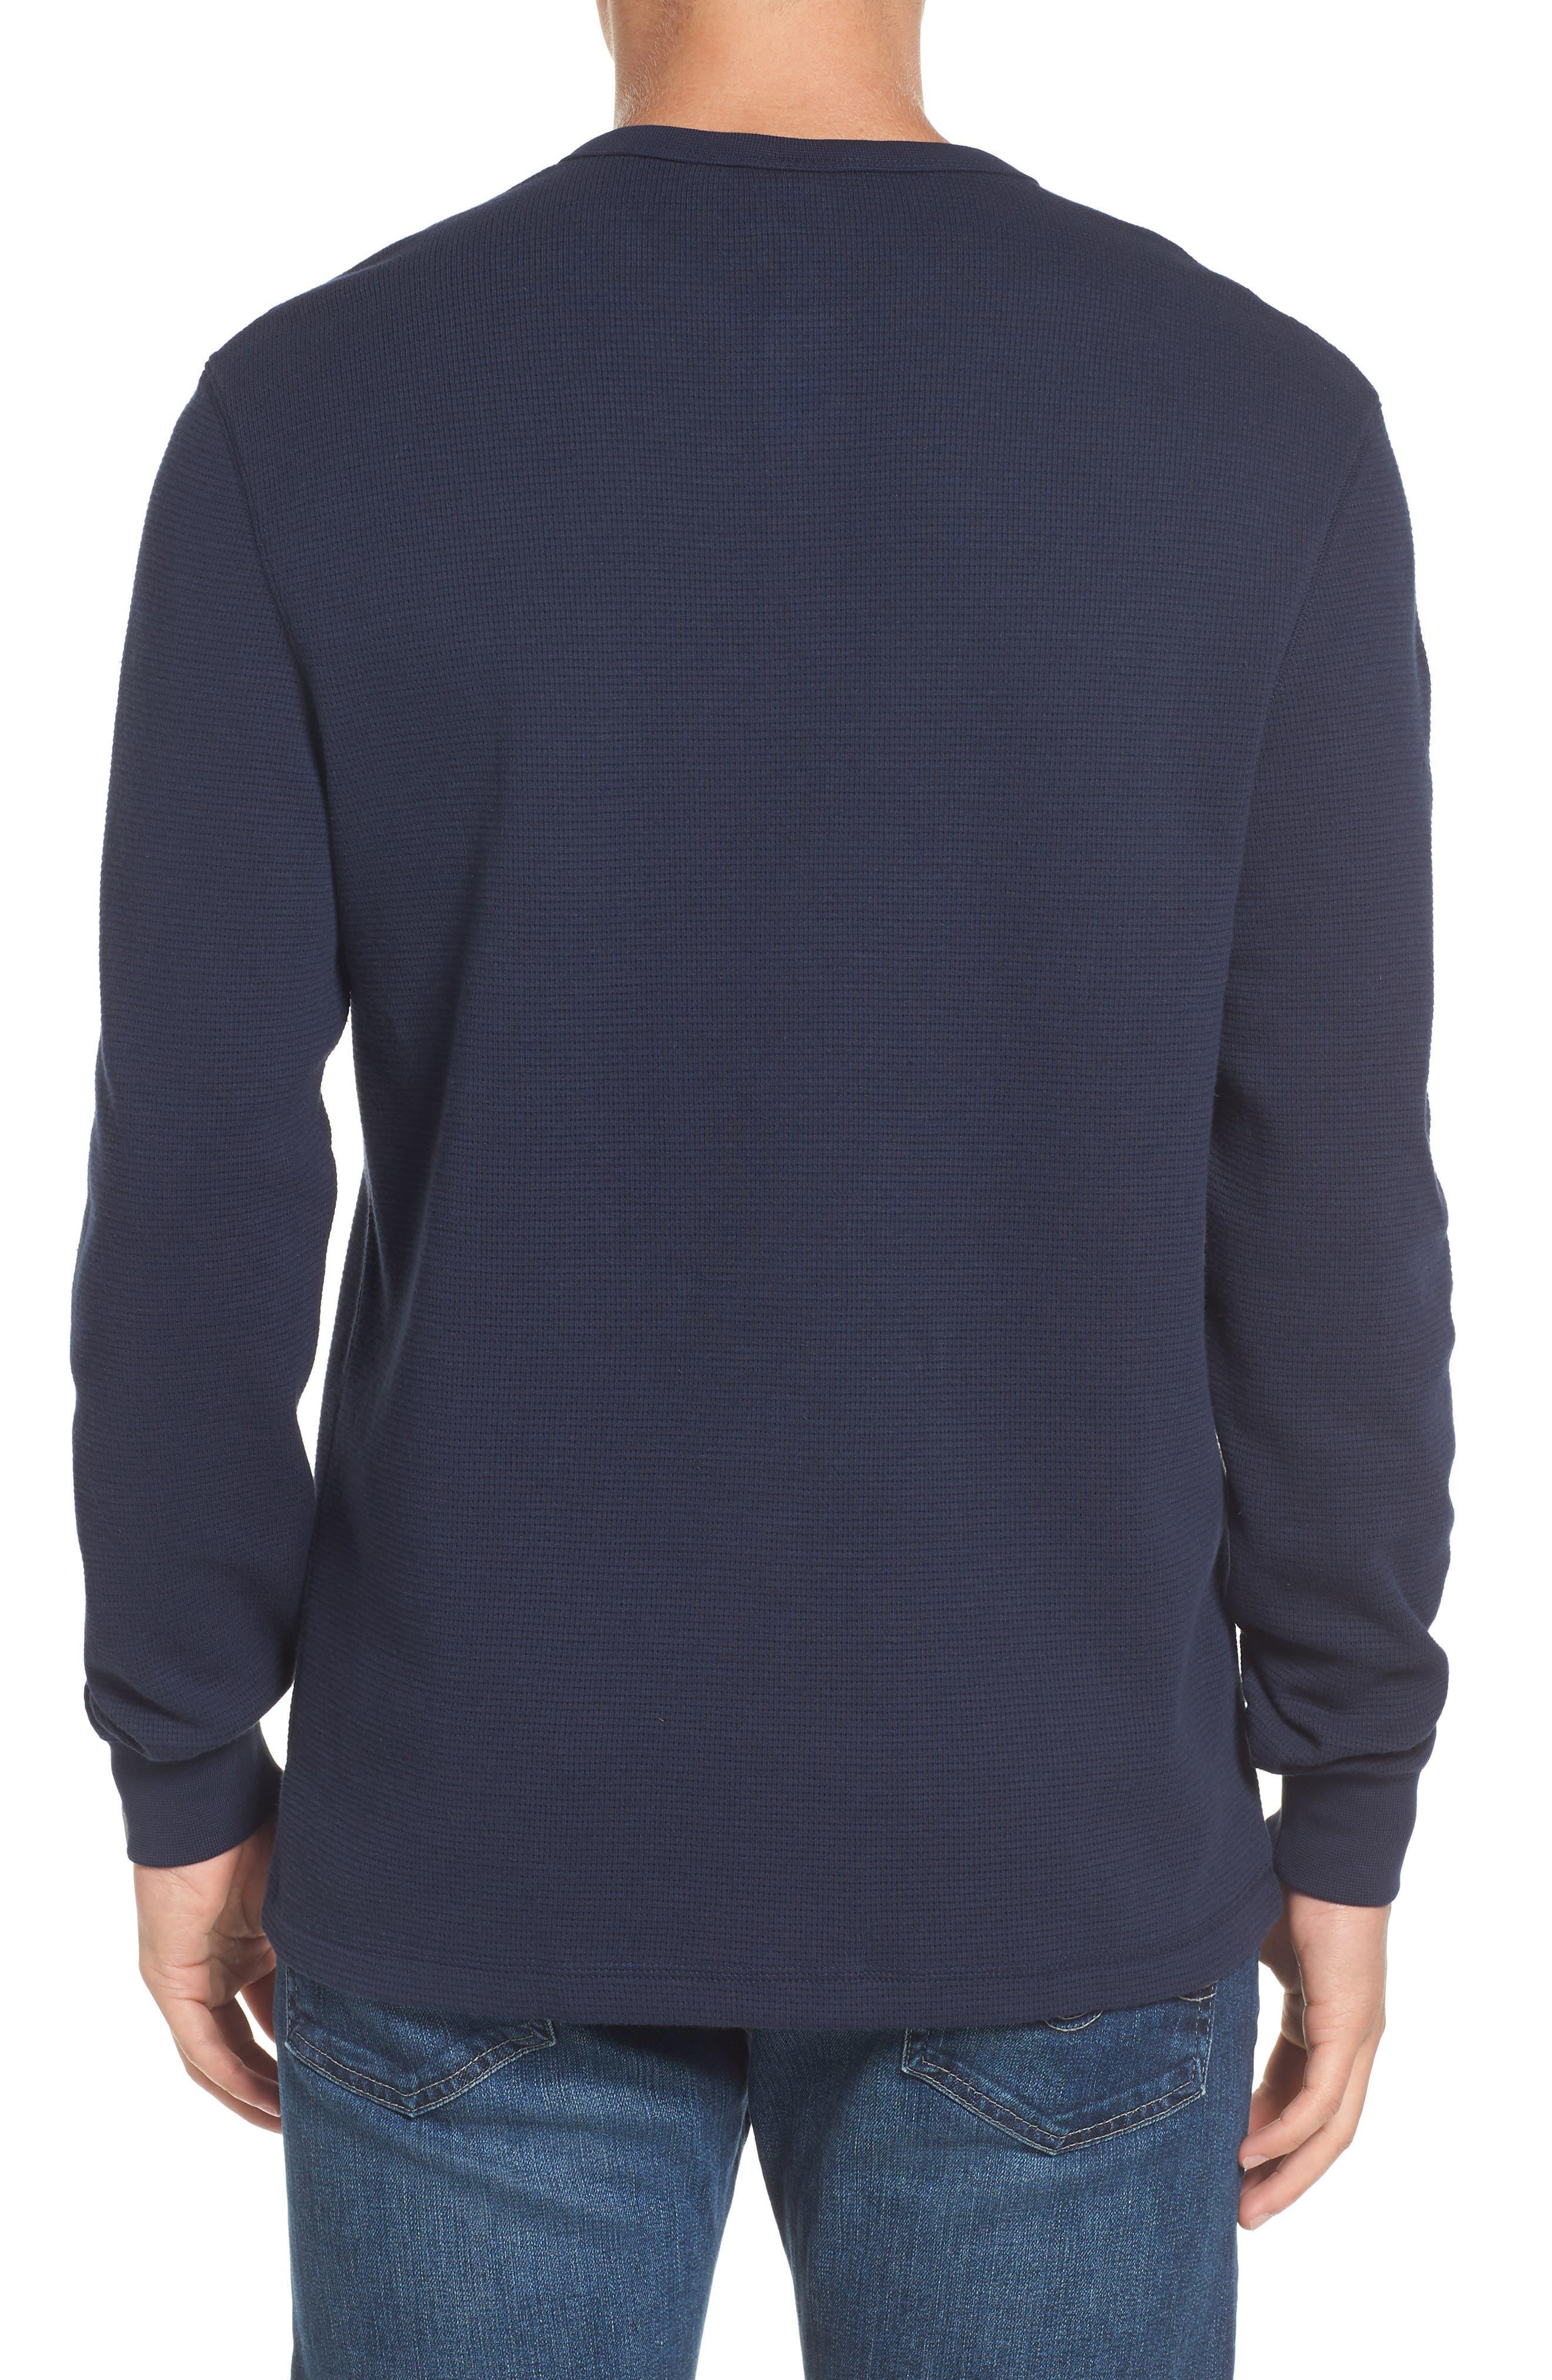 Henley T-Shirt,                             Alternate thumbnail 2, color,                             413